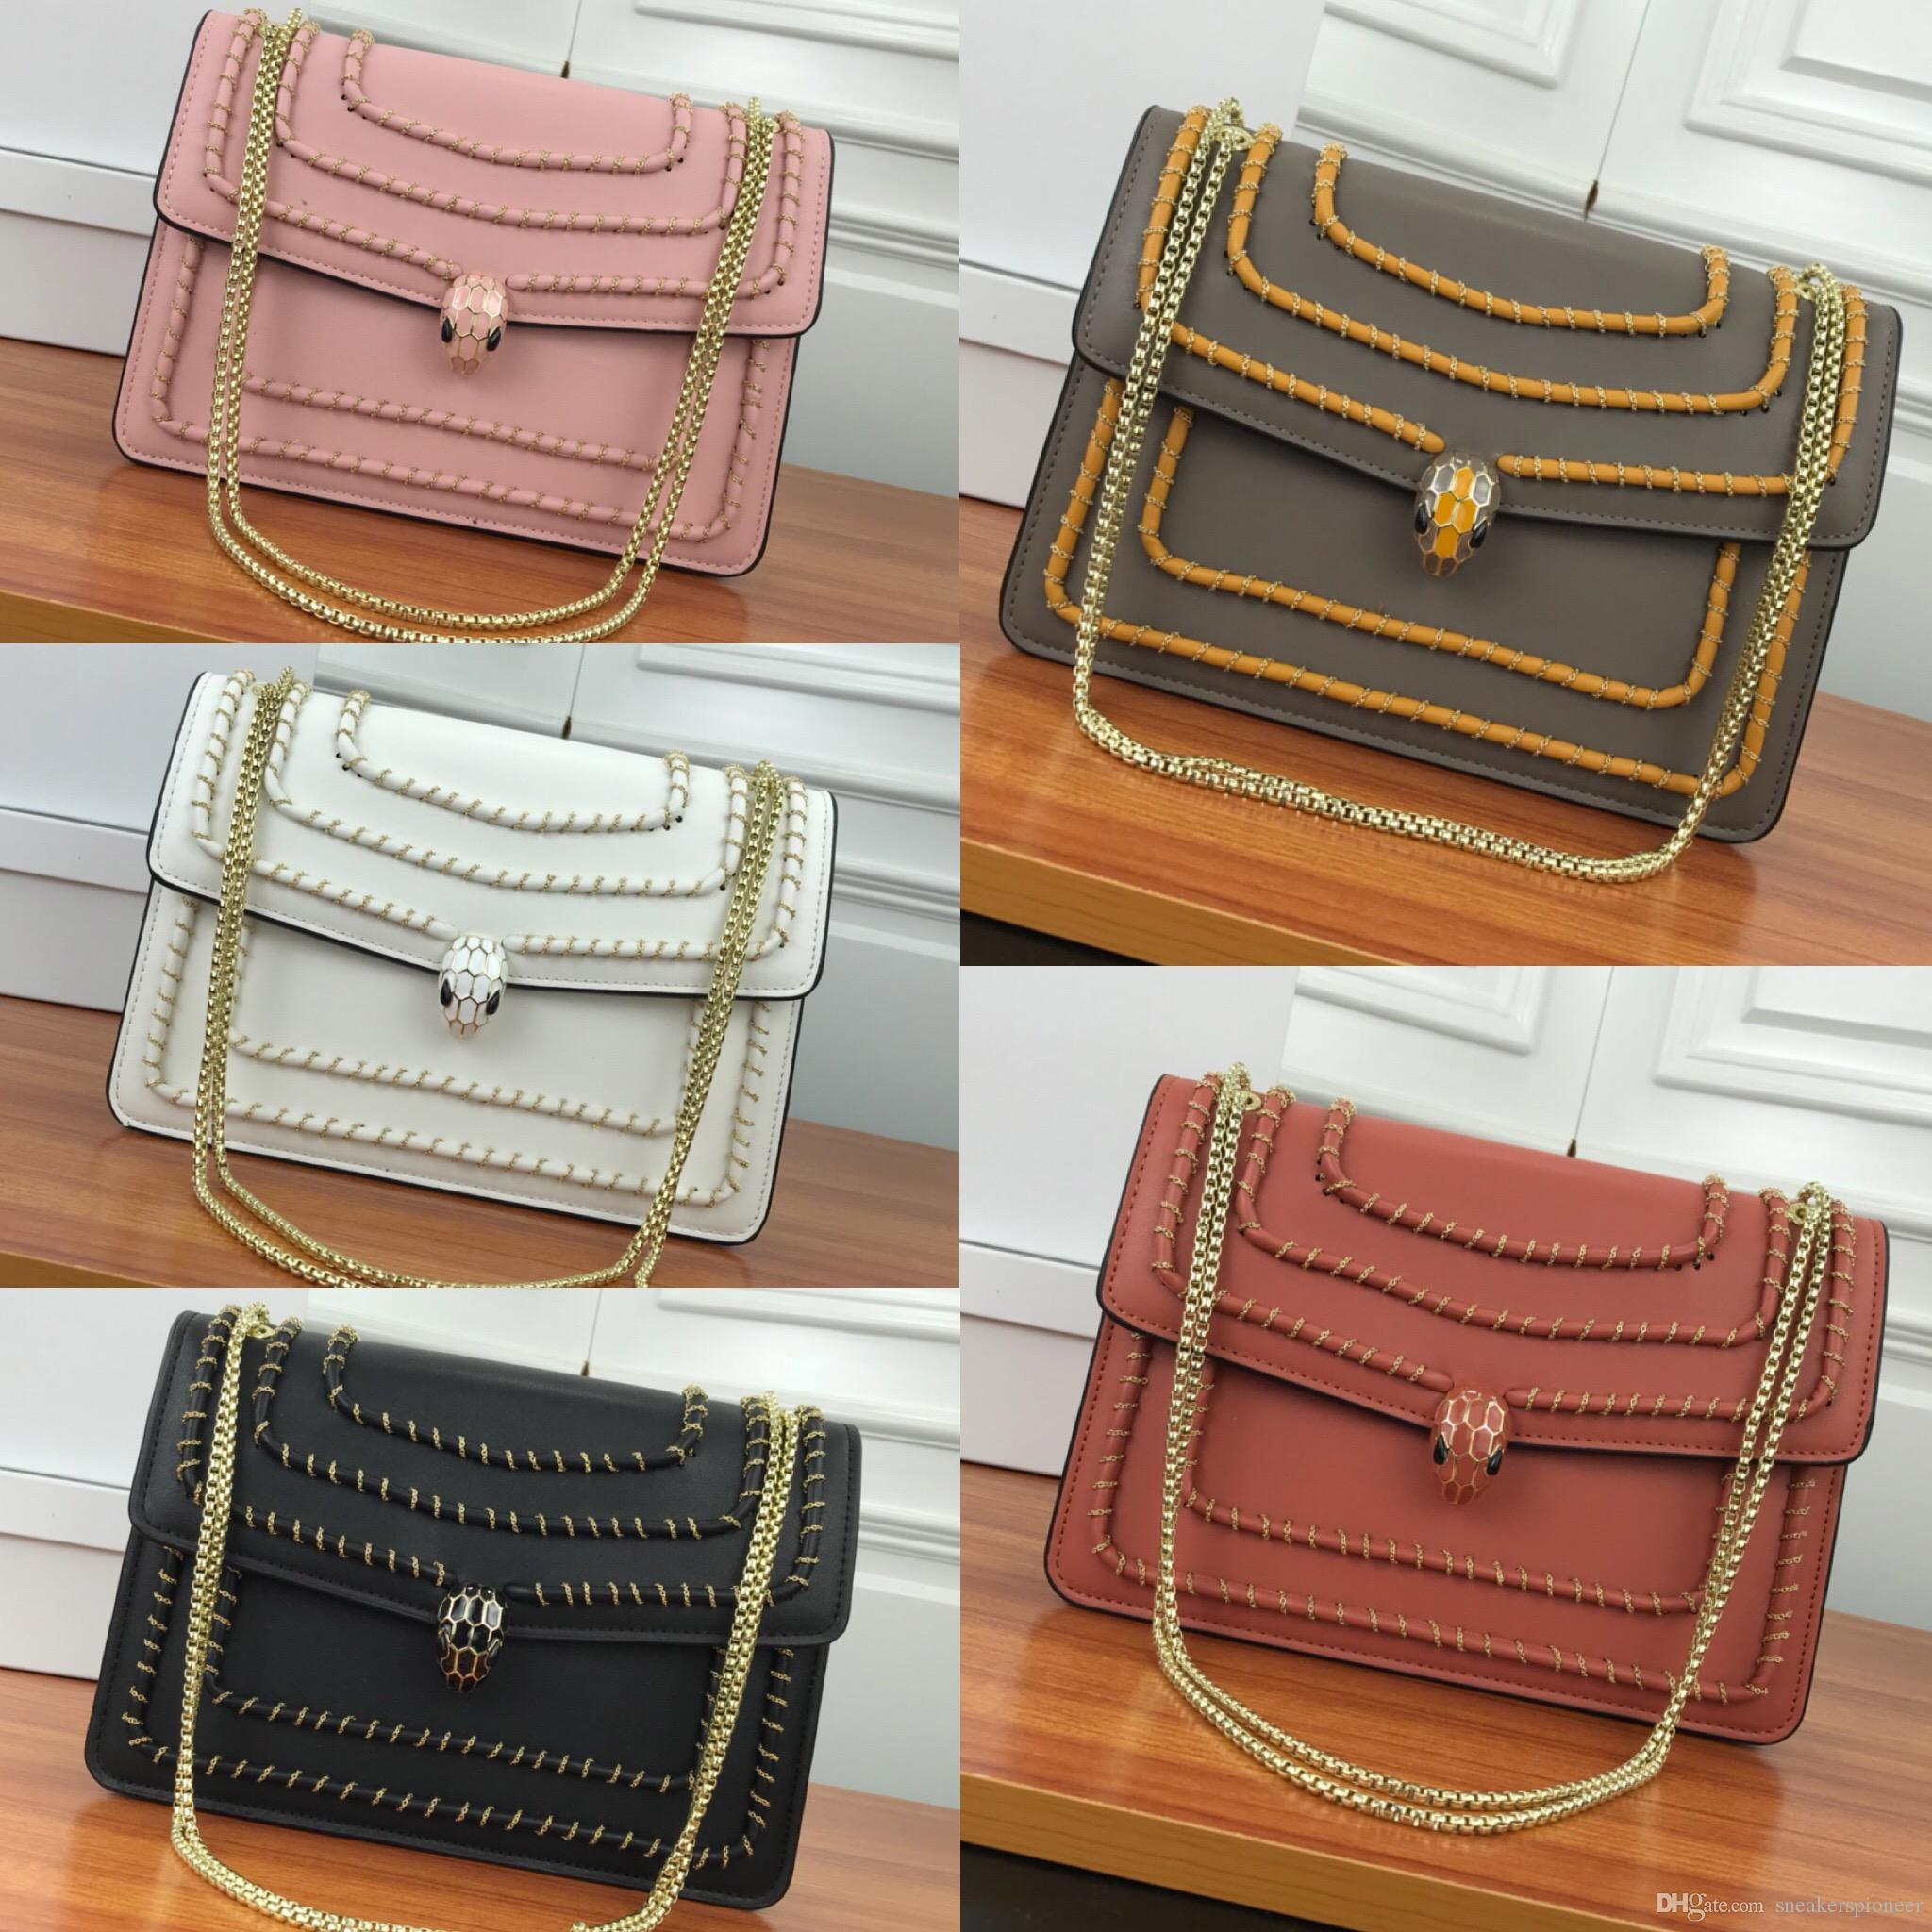 b8cc6b44 Women Designer Genuine Full Grain Leather Satchel baguette flap Cross-body  pouch Clutch Shoulder bag Fashion Handbag Casual High Quality